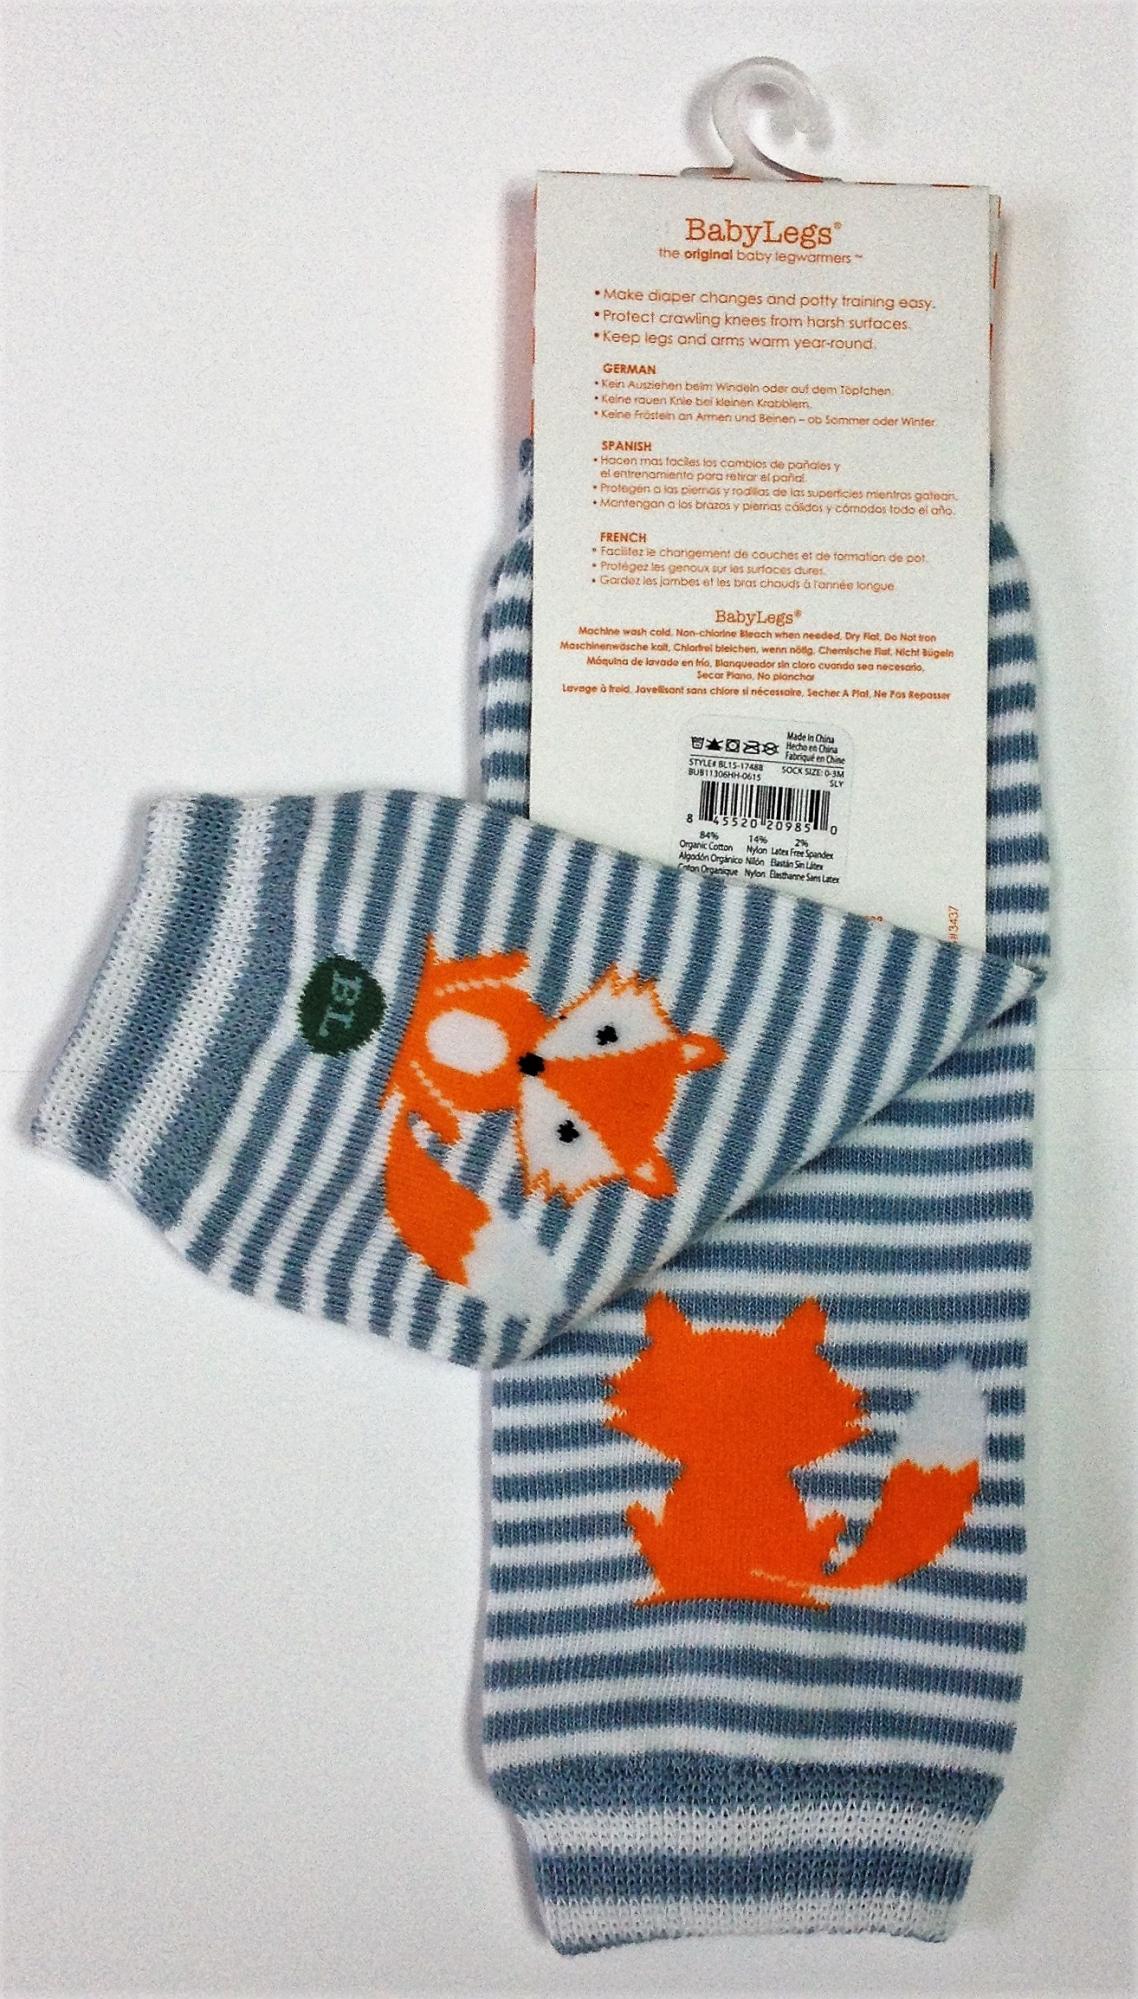 babylegs-newborn-sly-fox-both.jpg